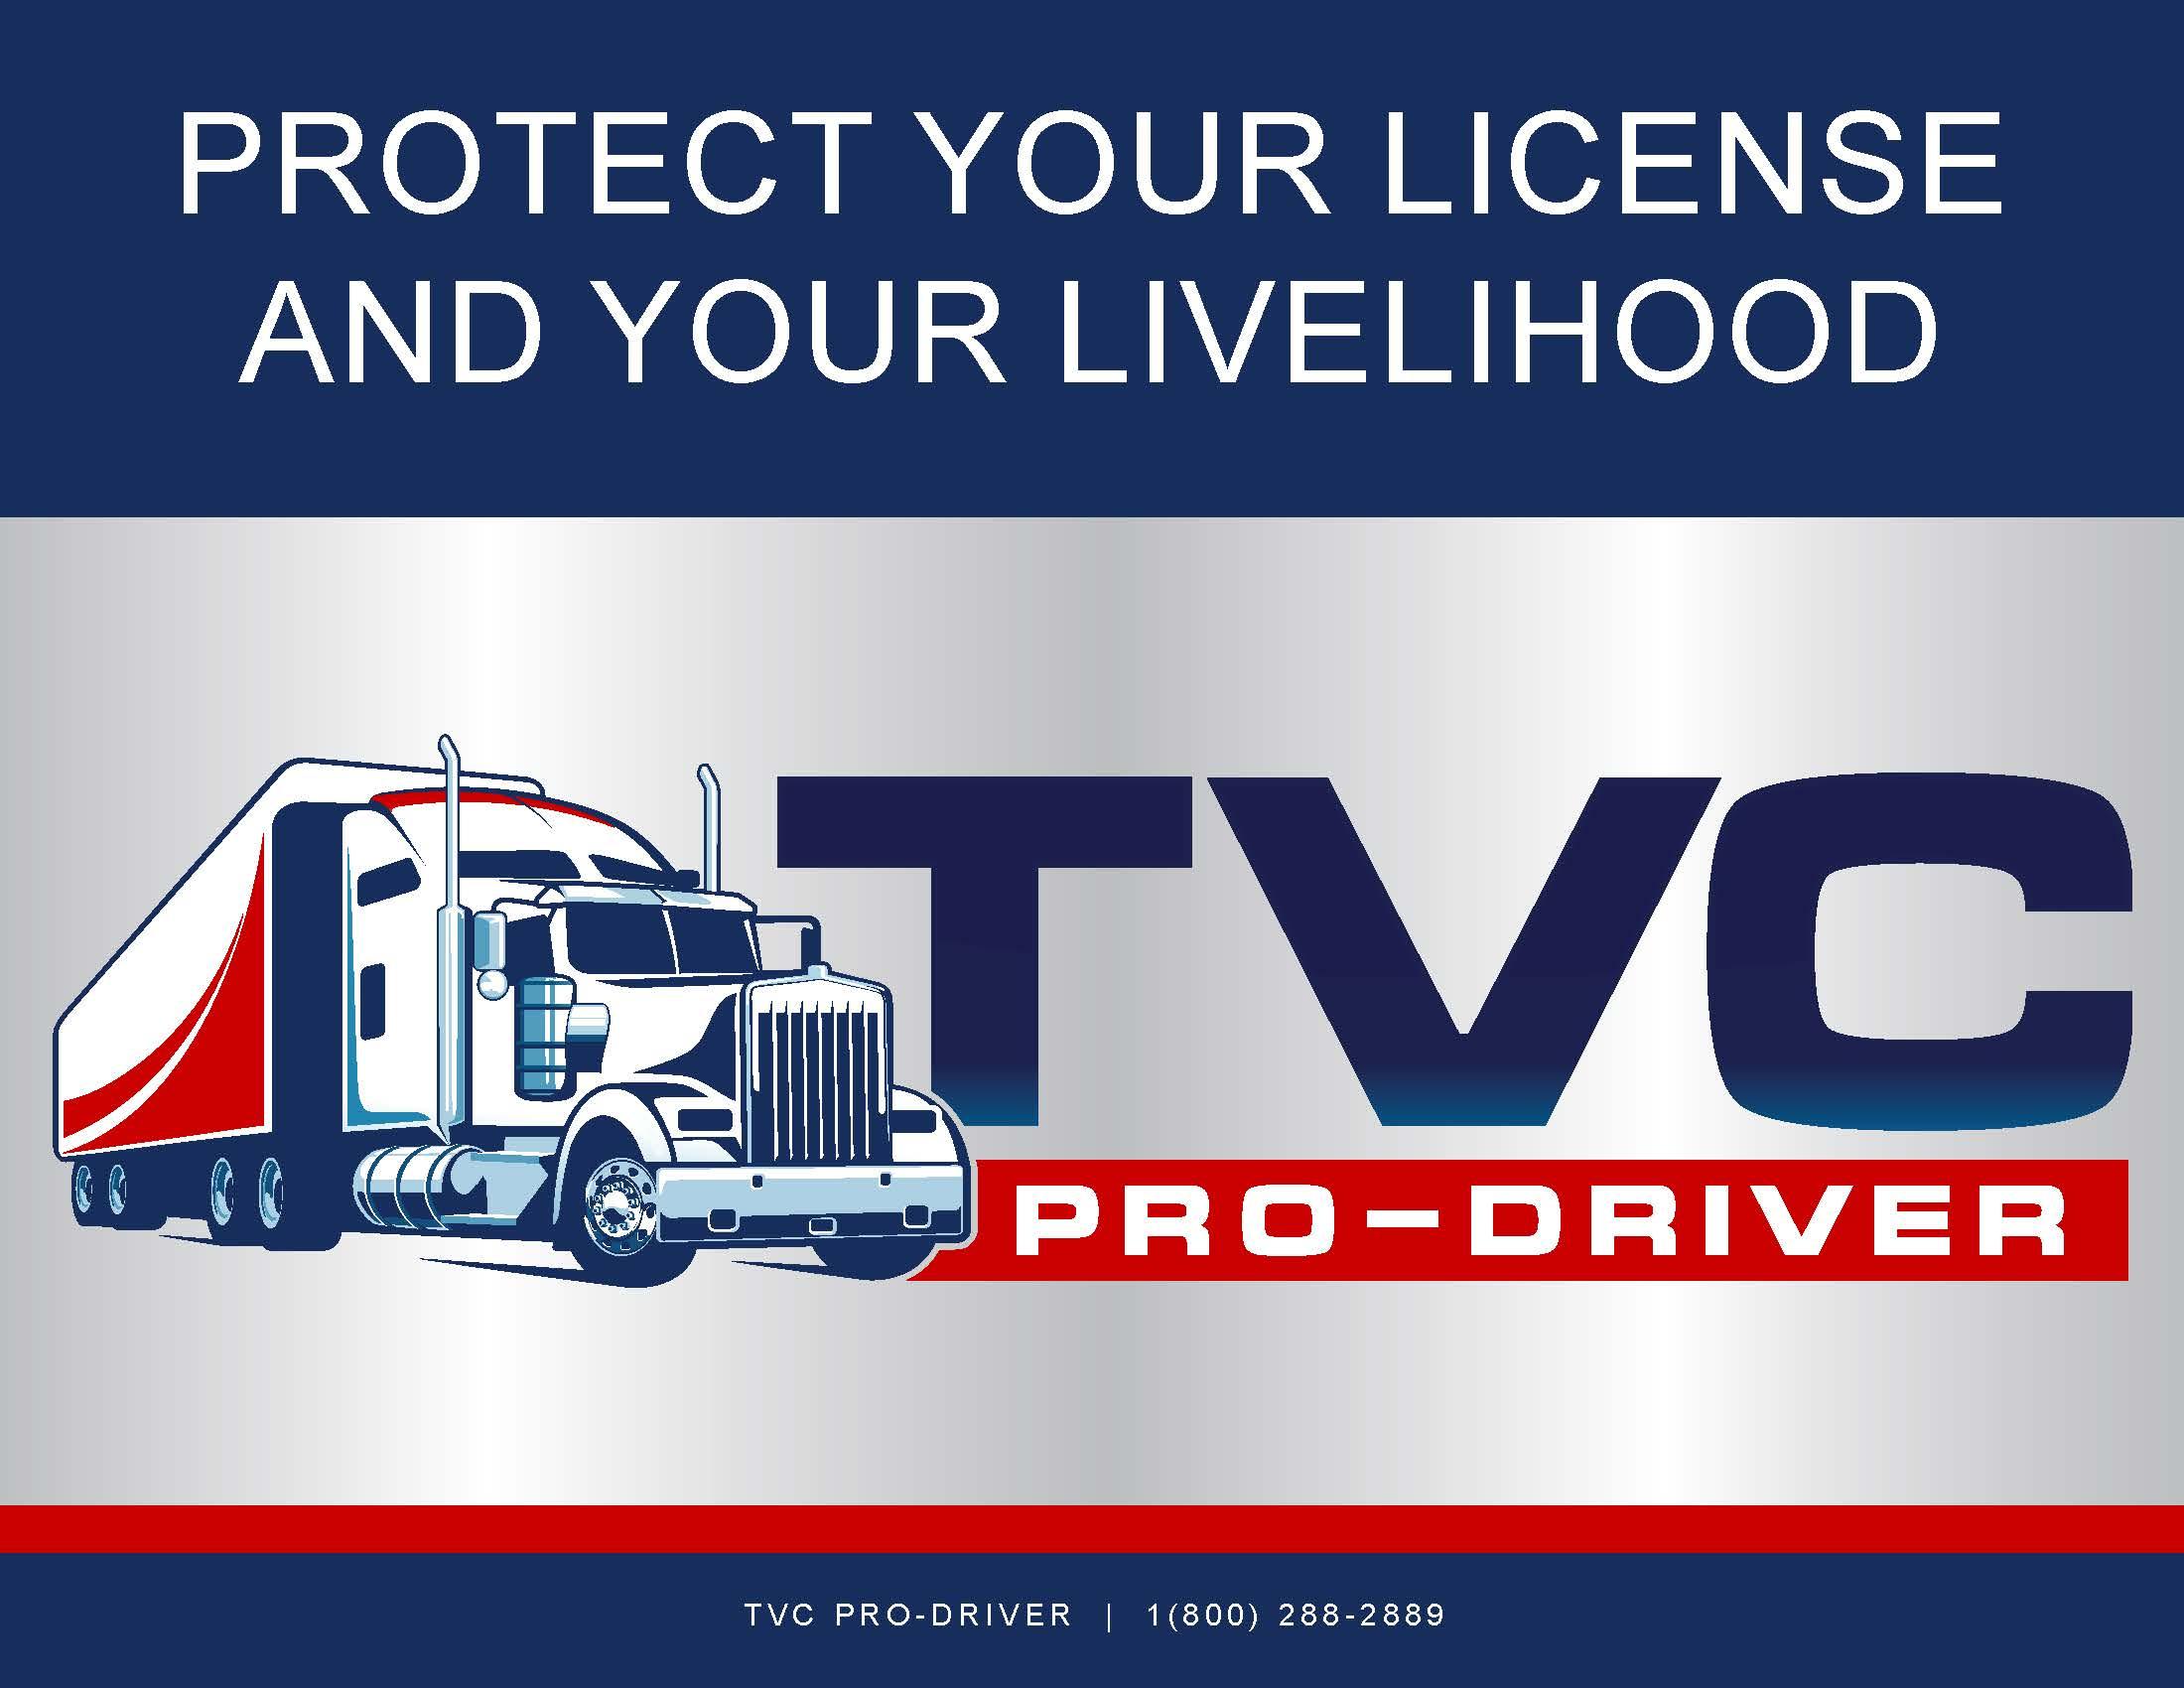 TVC Pro Driver Legal Services